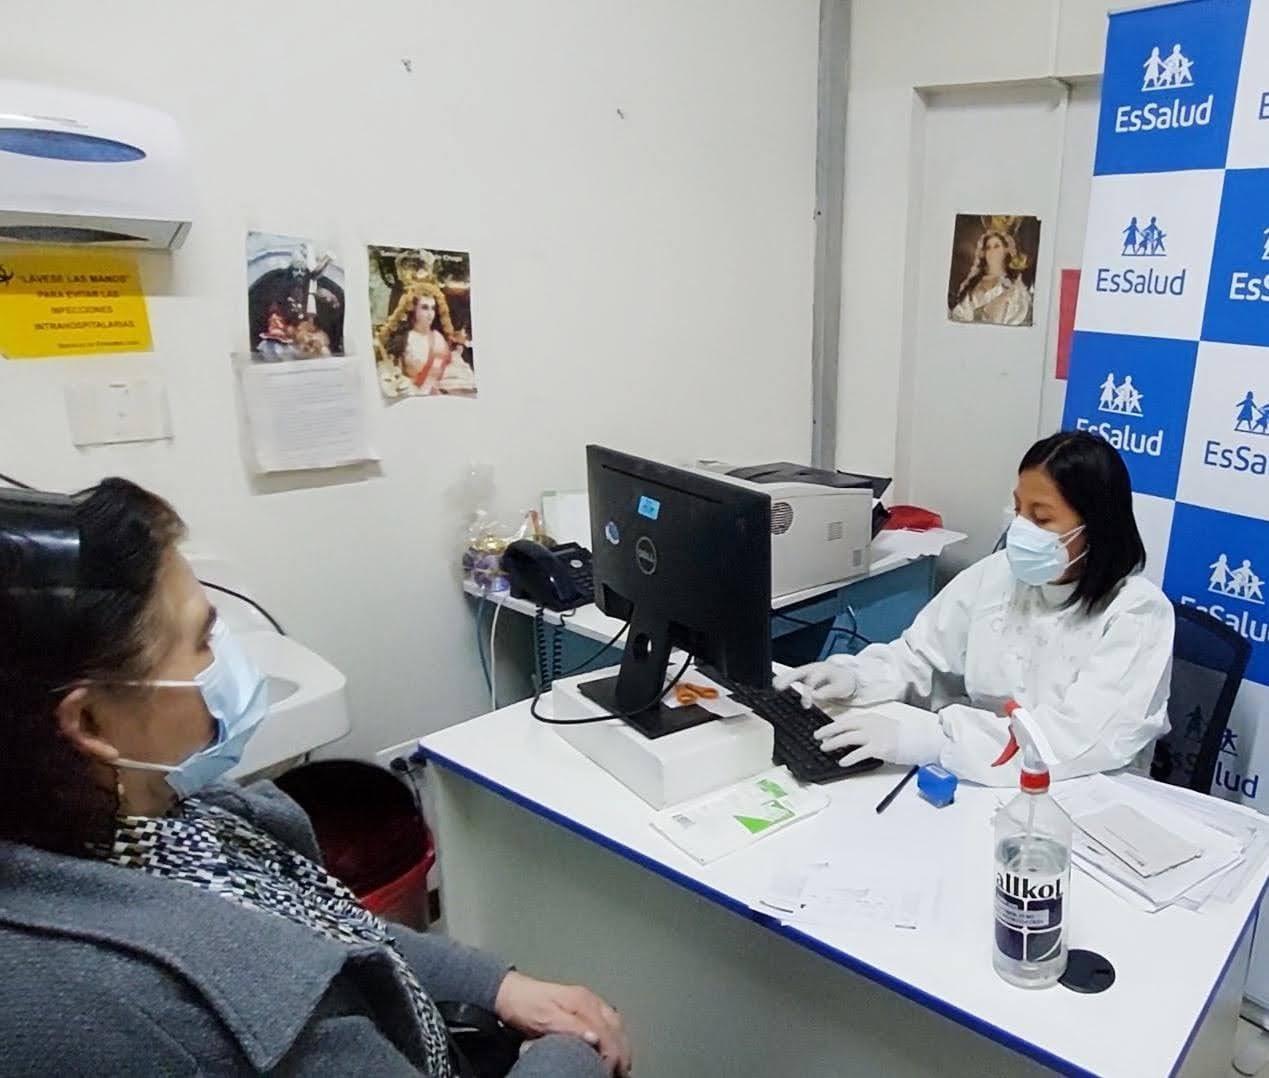 Essalud - EsSalud Arequipa recomienda ejercicios para prevenir osteoporosis